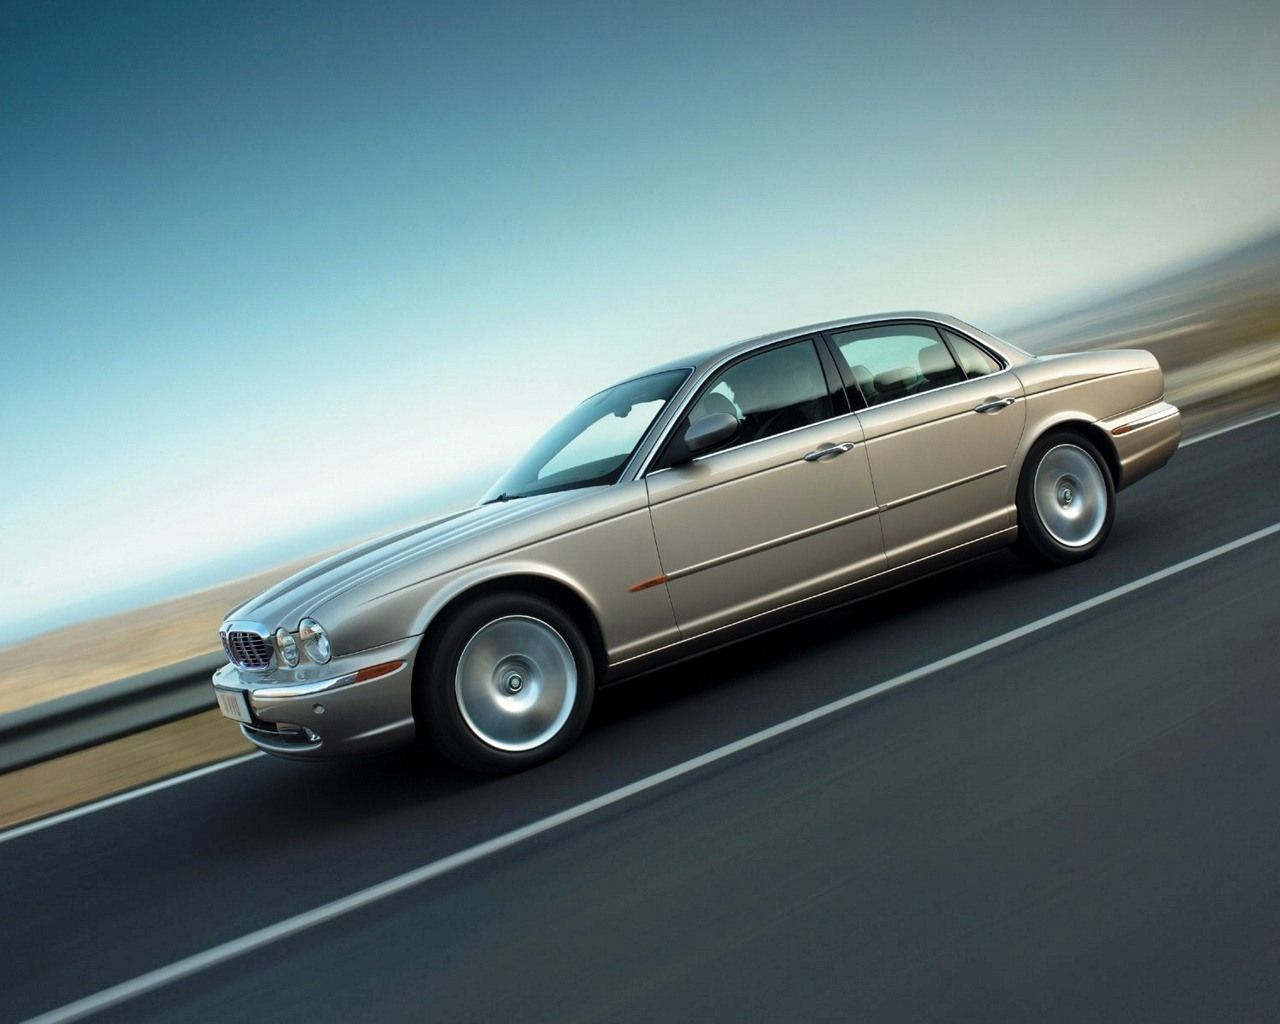 http://2.bp.blogspot.com/-msOHUyCcZcI/T6HxIpX8GwI/AAAAAAAABIs/StJCYrTA8v4/s1600/Jaguar_HD_Car_Wallpaper_Blu_Ray_1080p+%25281%2529.jpg